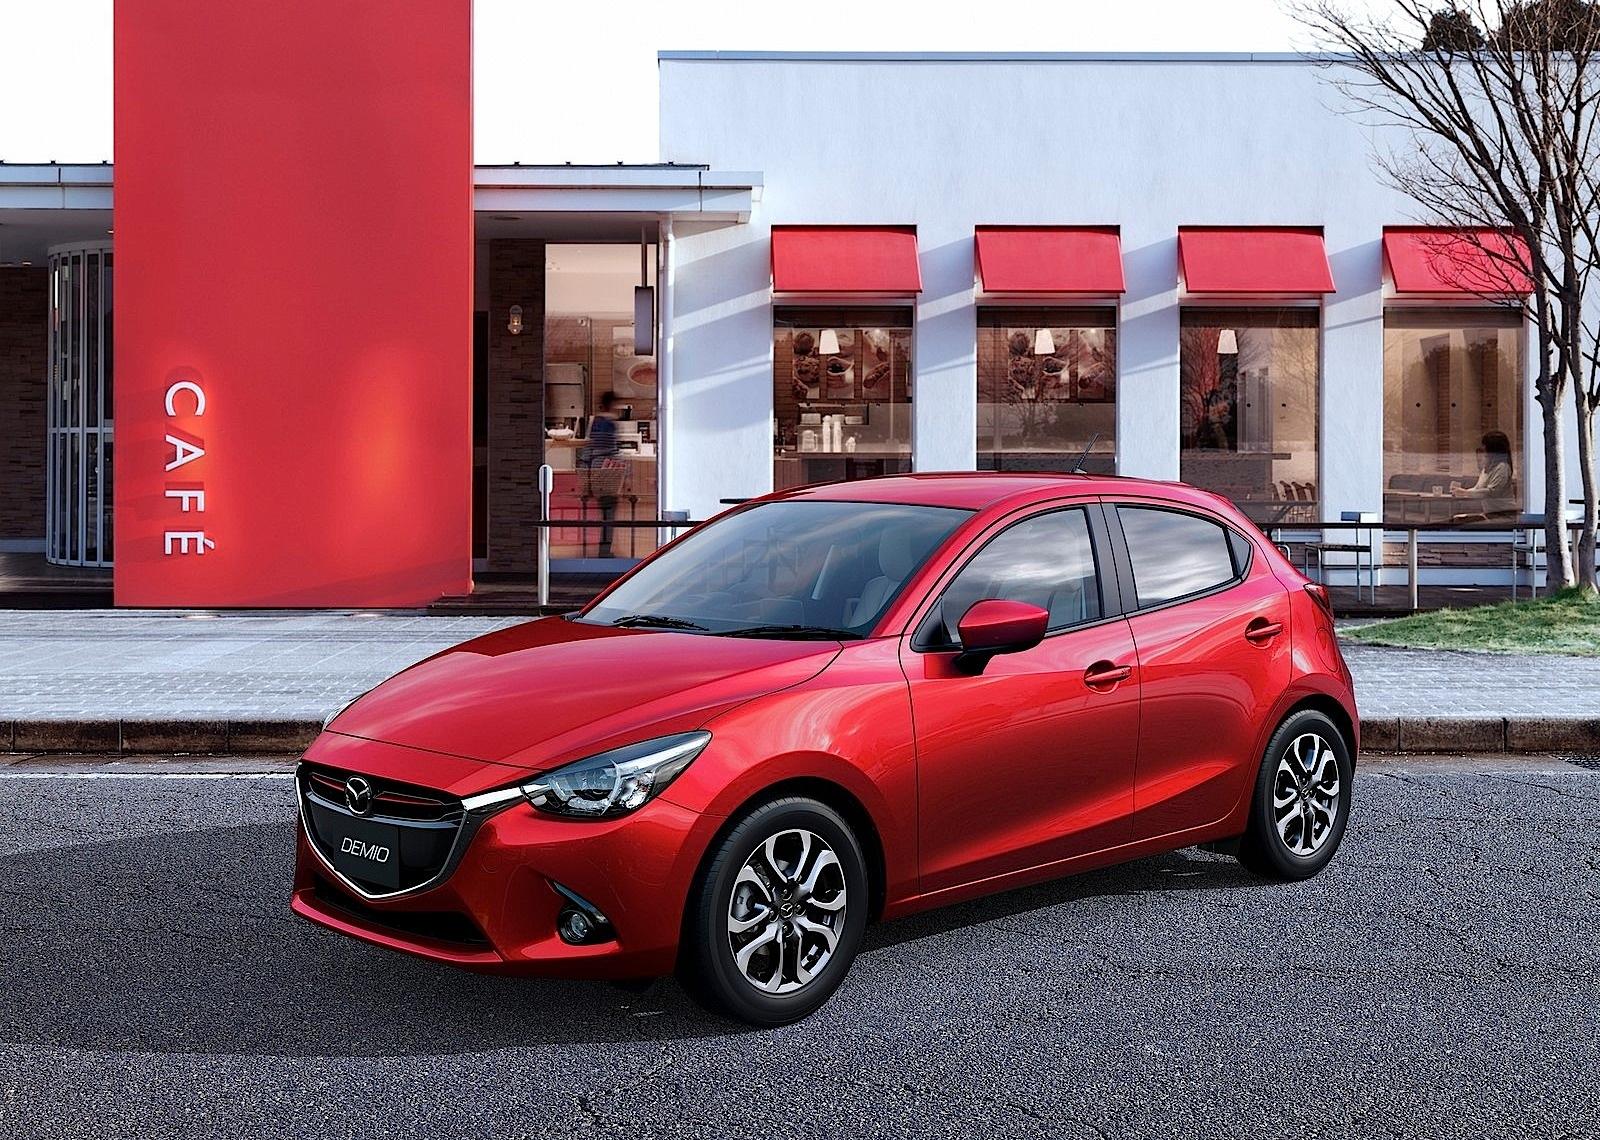 Kekurangan Mazda 2 2016 Spesifikasi